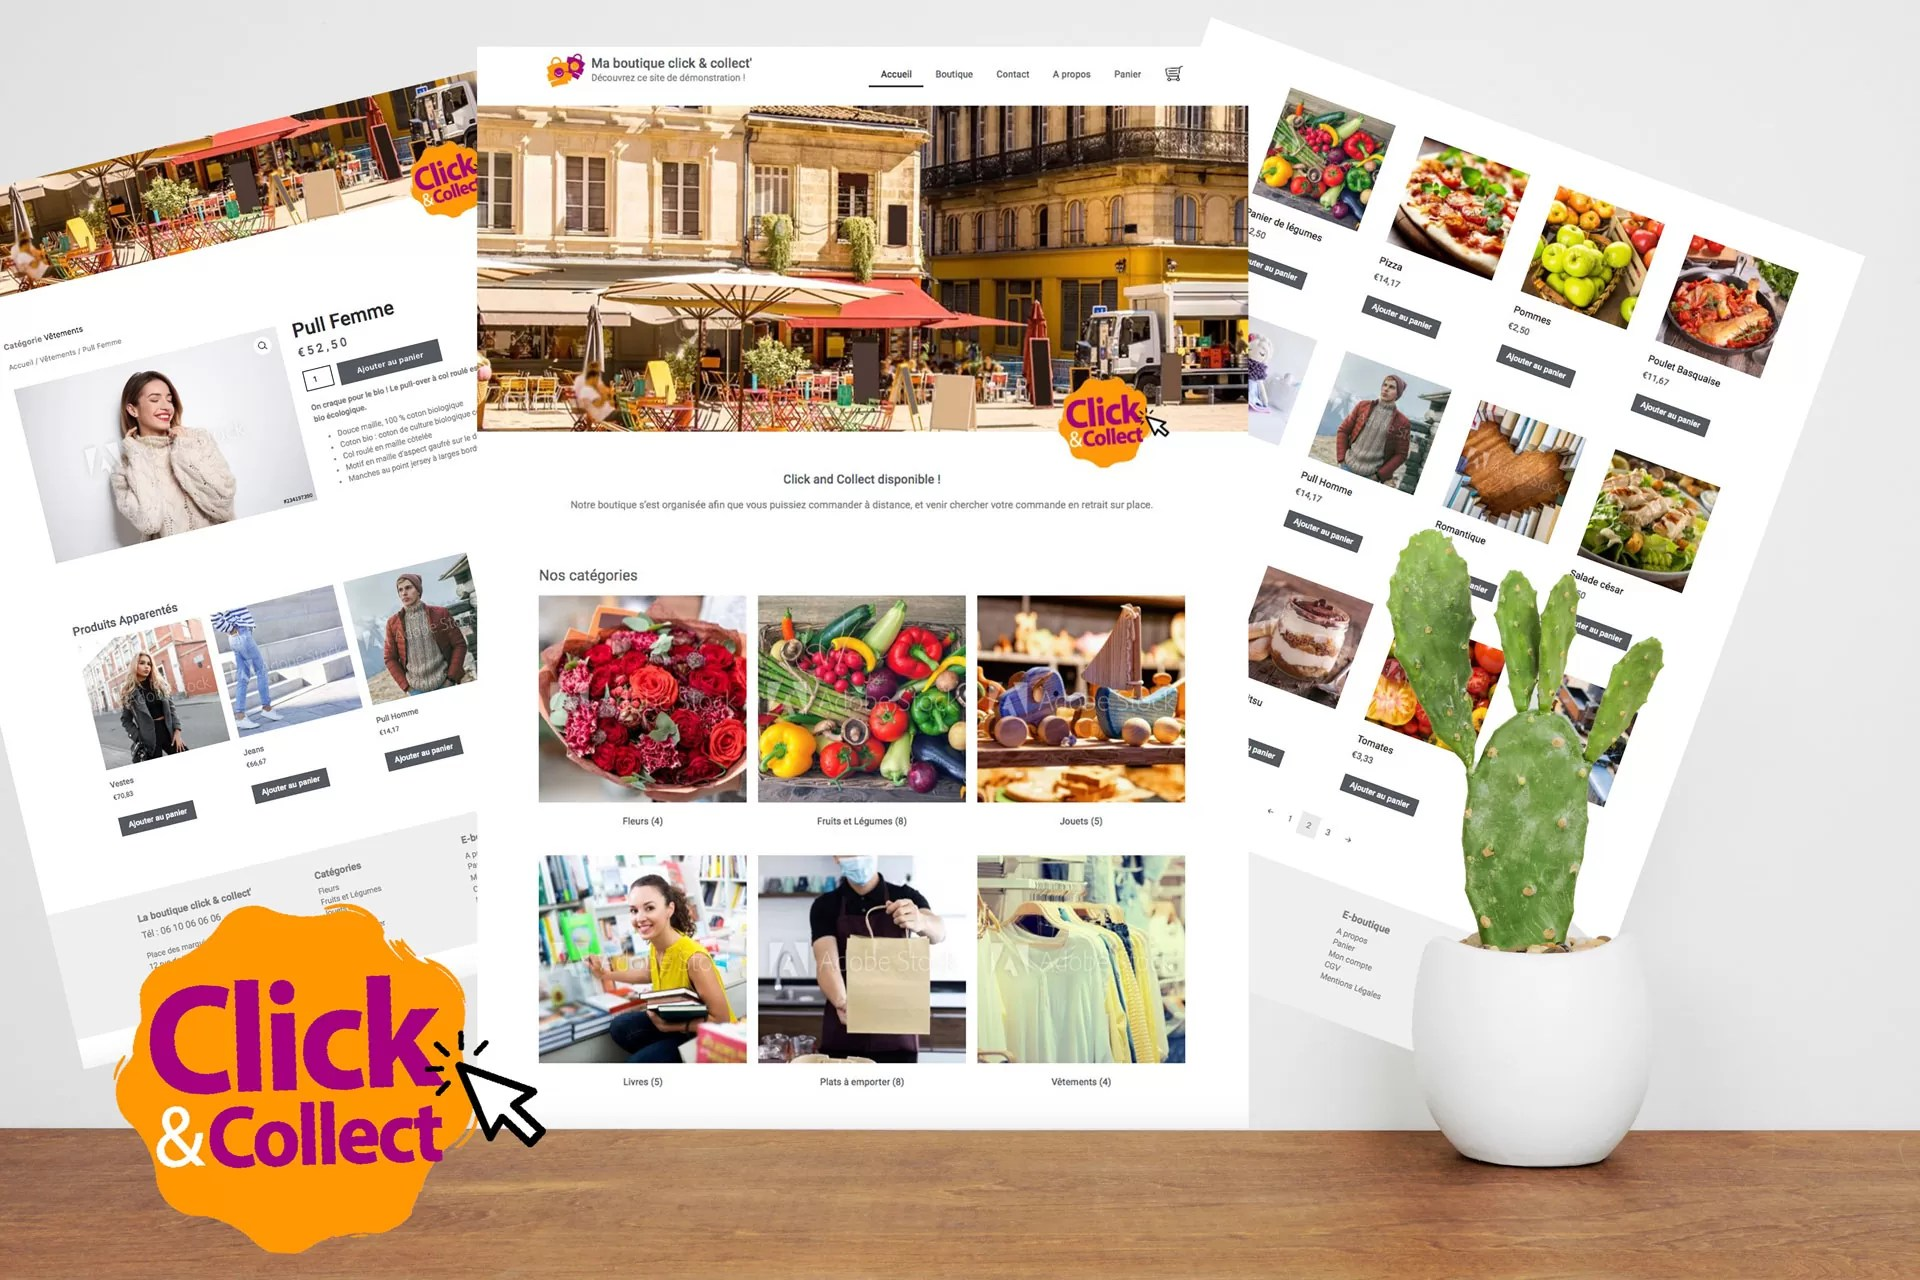 BoutiquClick and collect site e-boutique vente à emporter